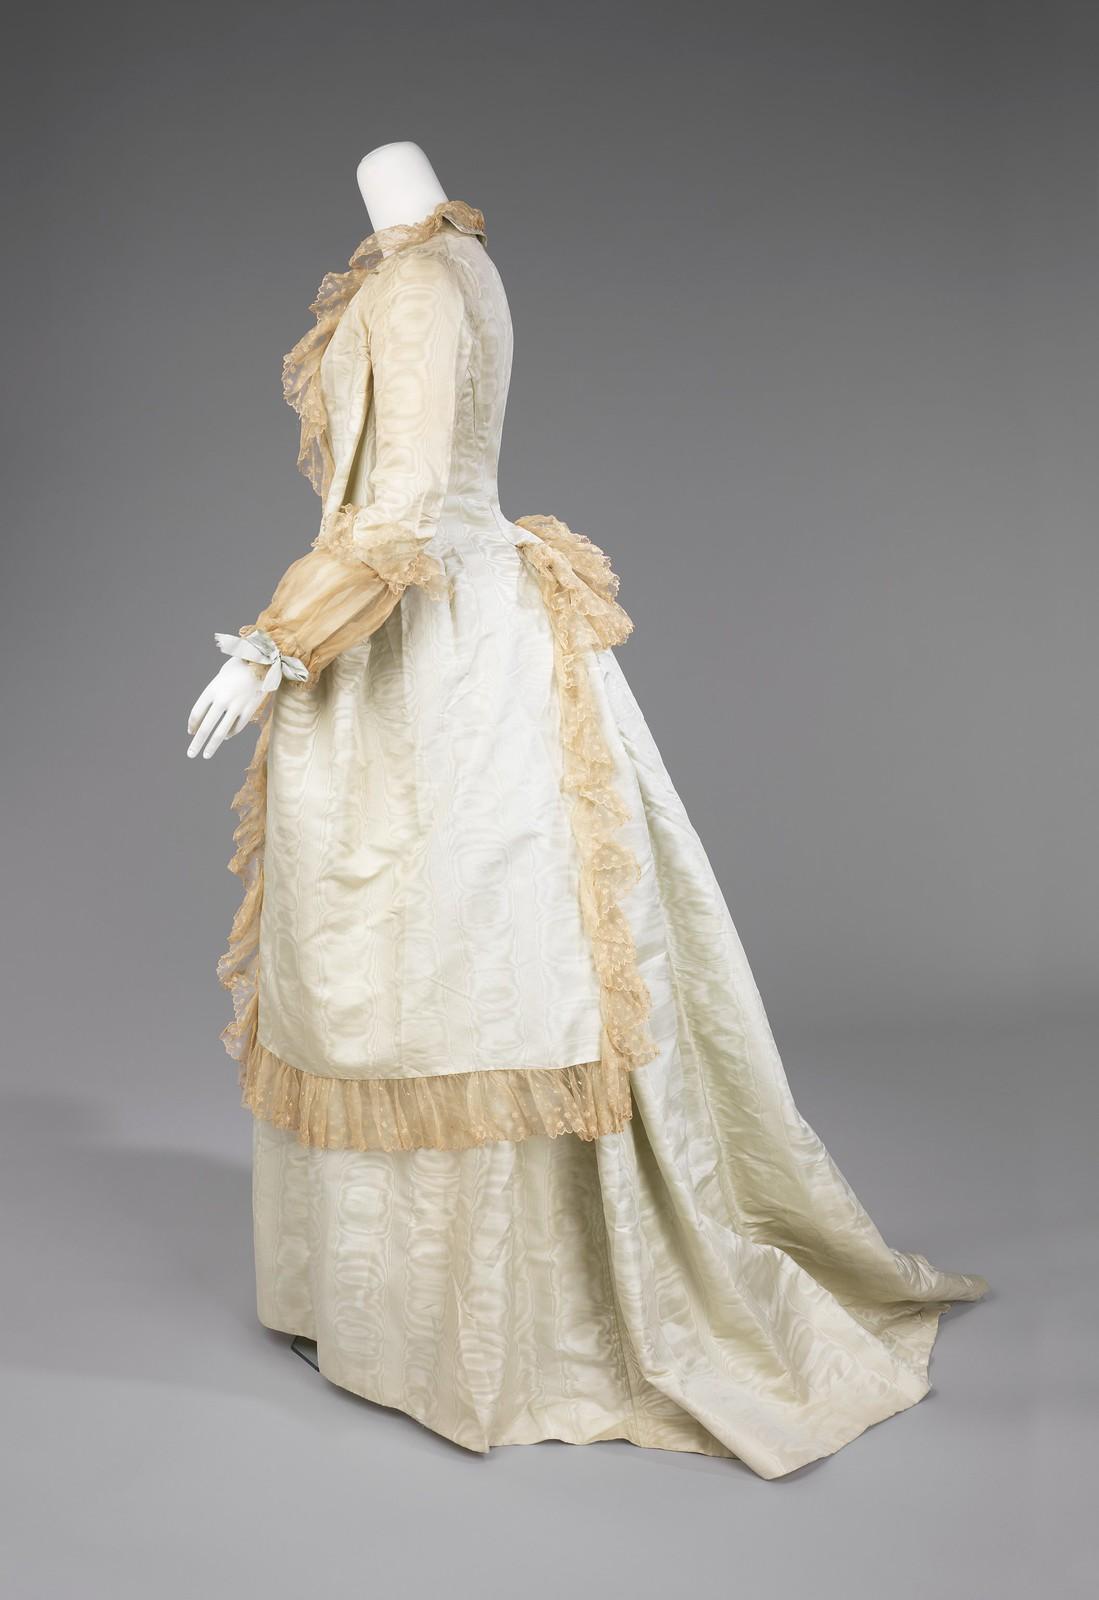 c1878. American. Silk, cotton. metmuseum